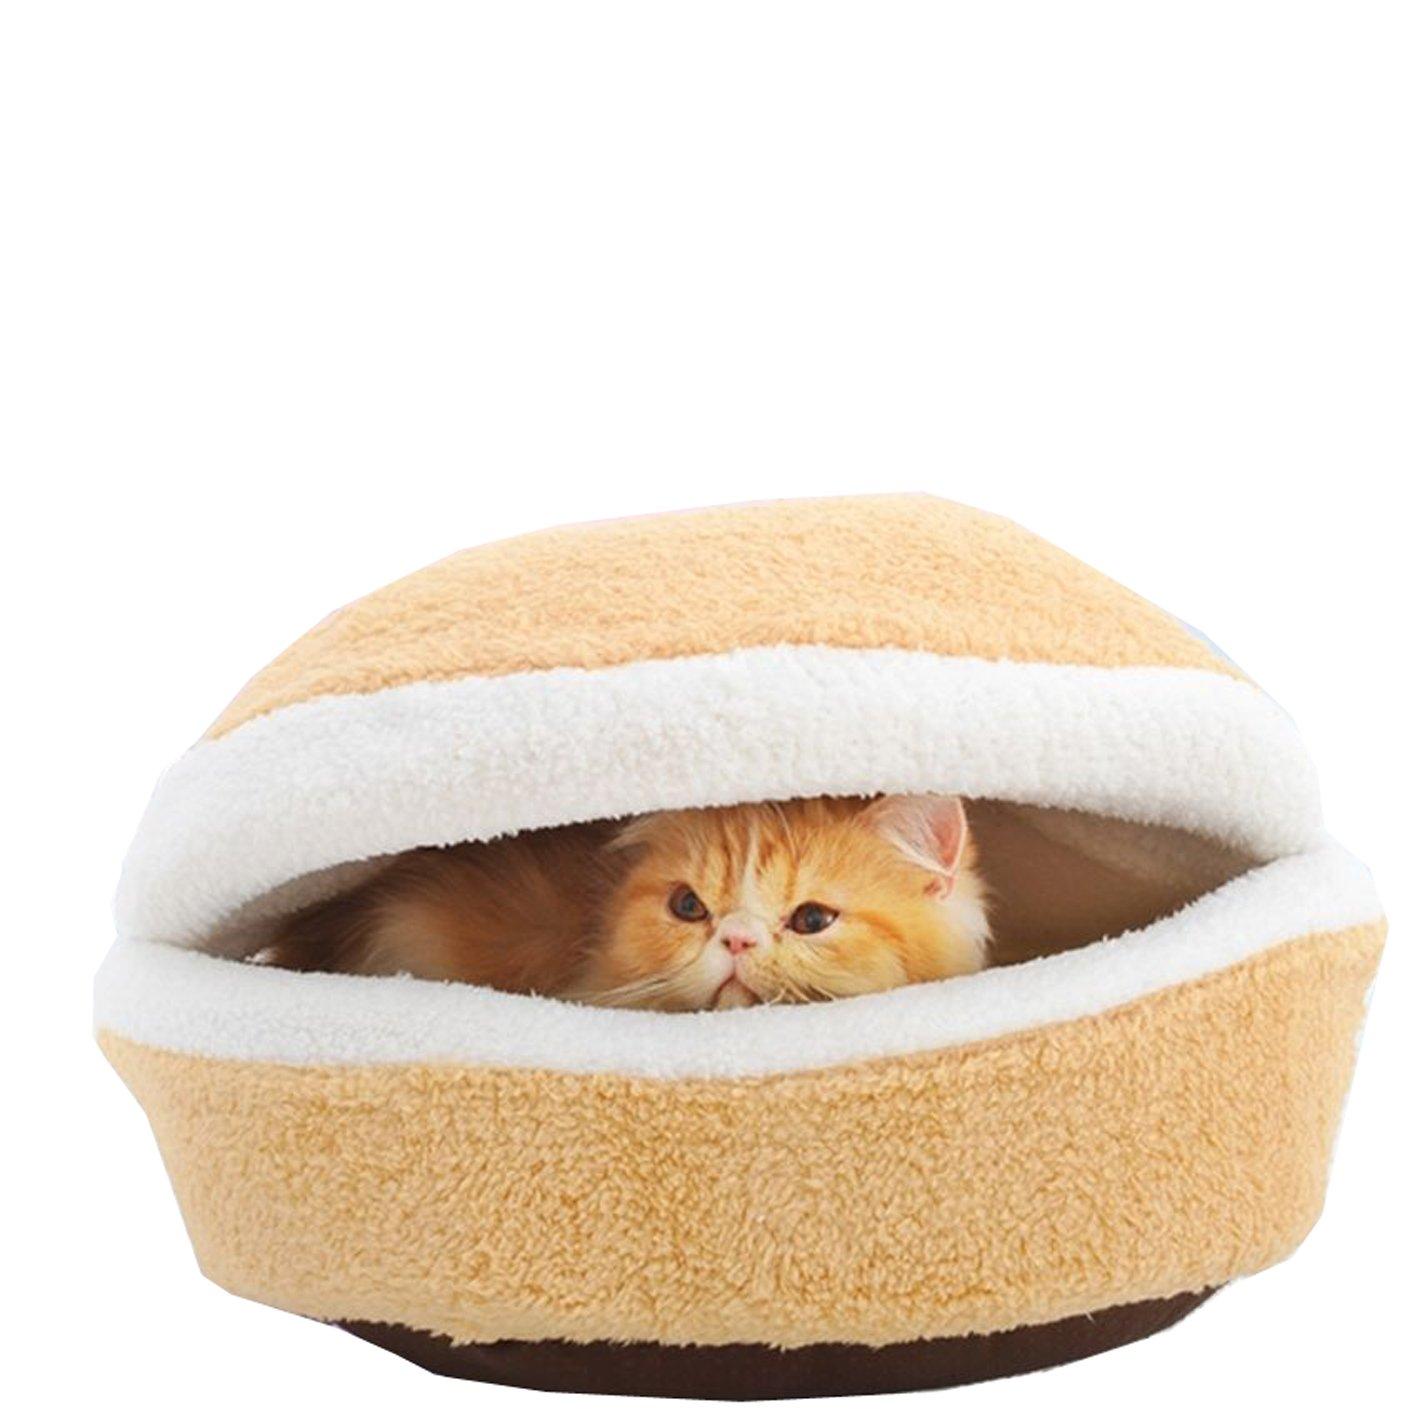 Edtoy Hamburger Beds Nest Shape Nursey Bed for Animals Cute (L)